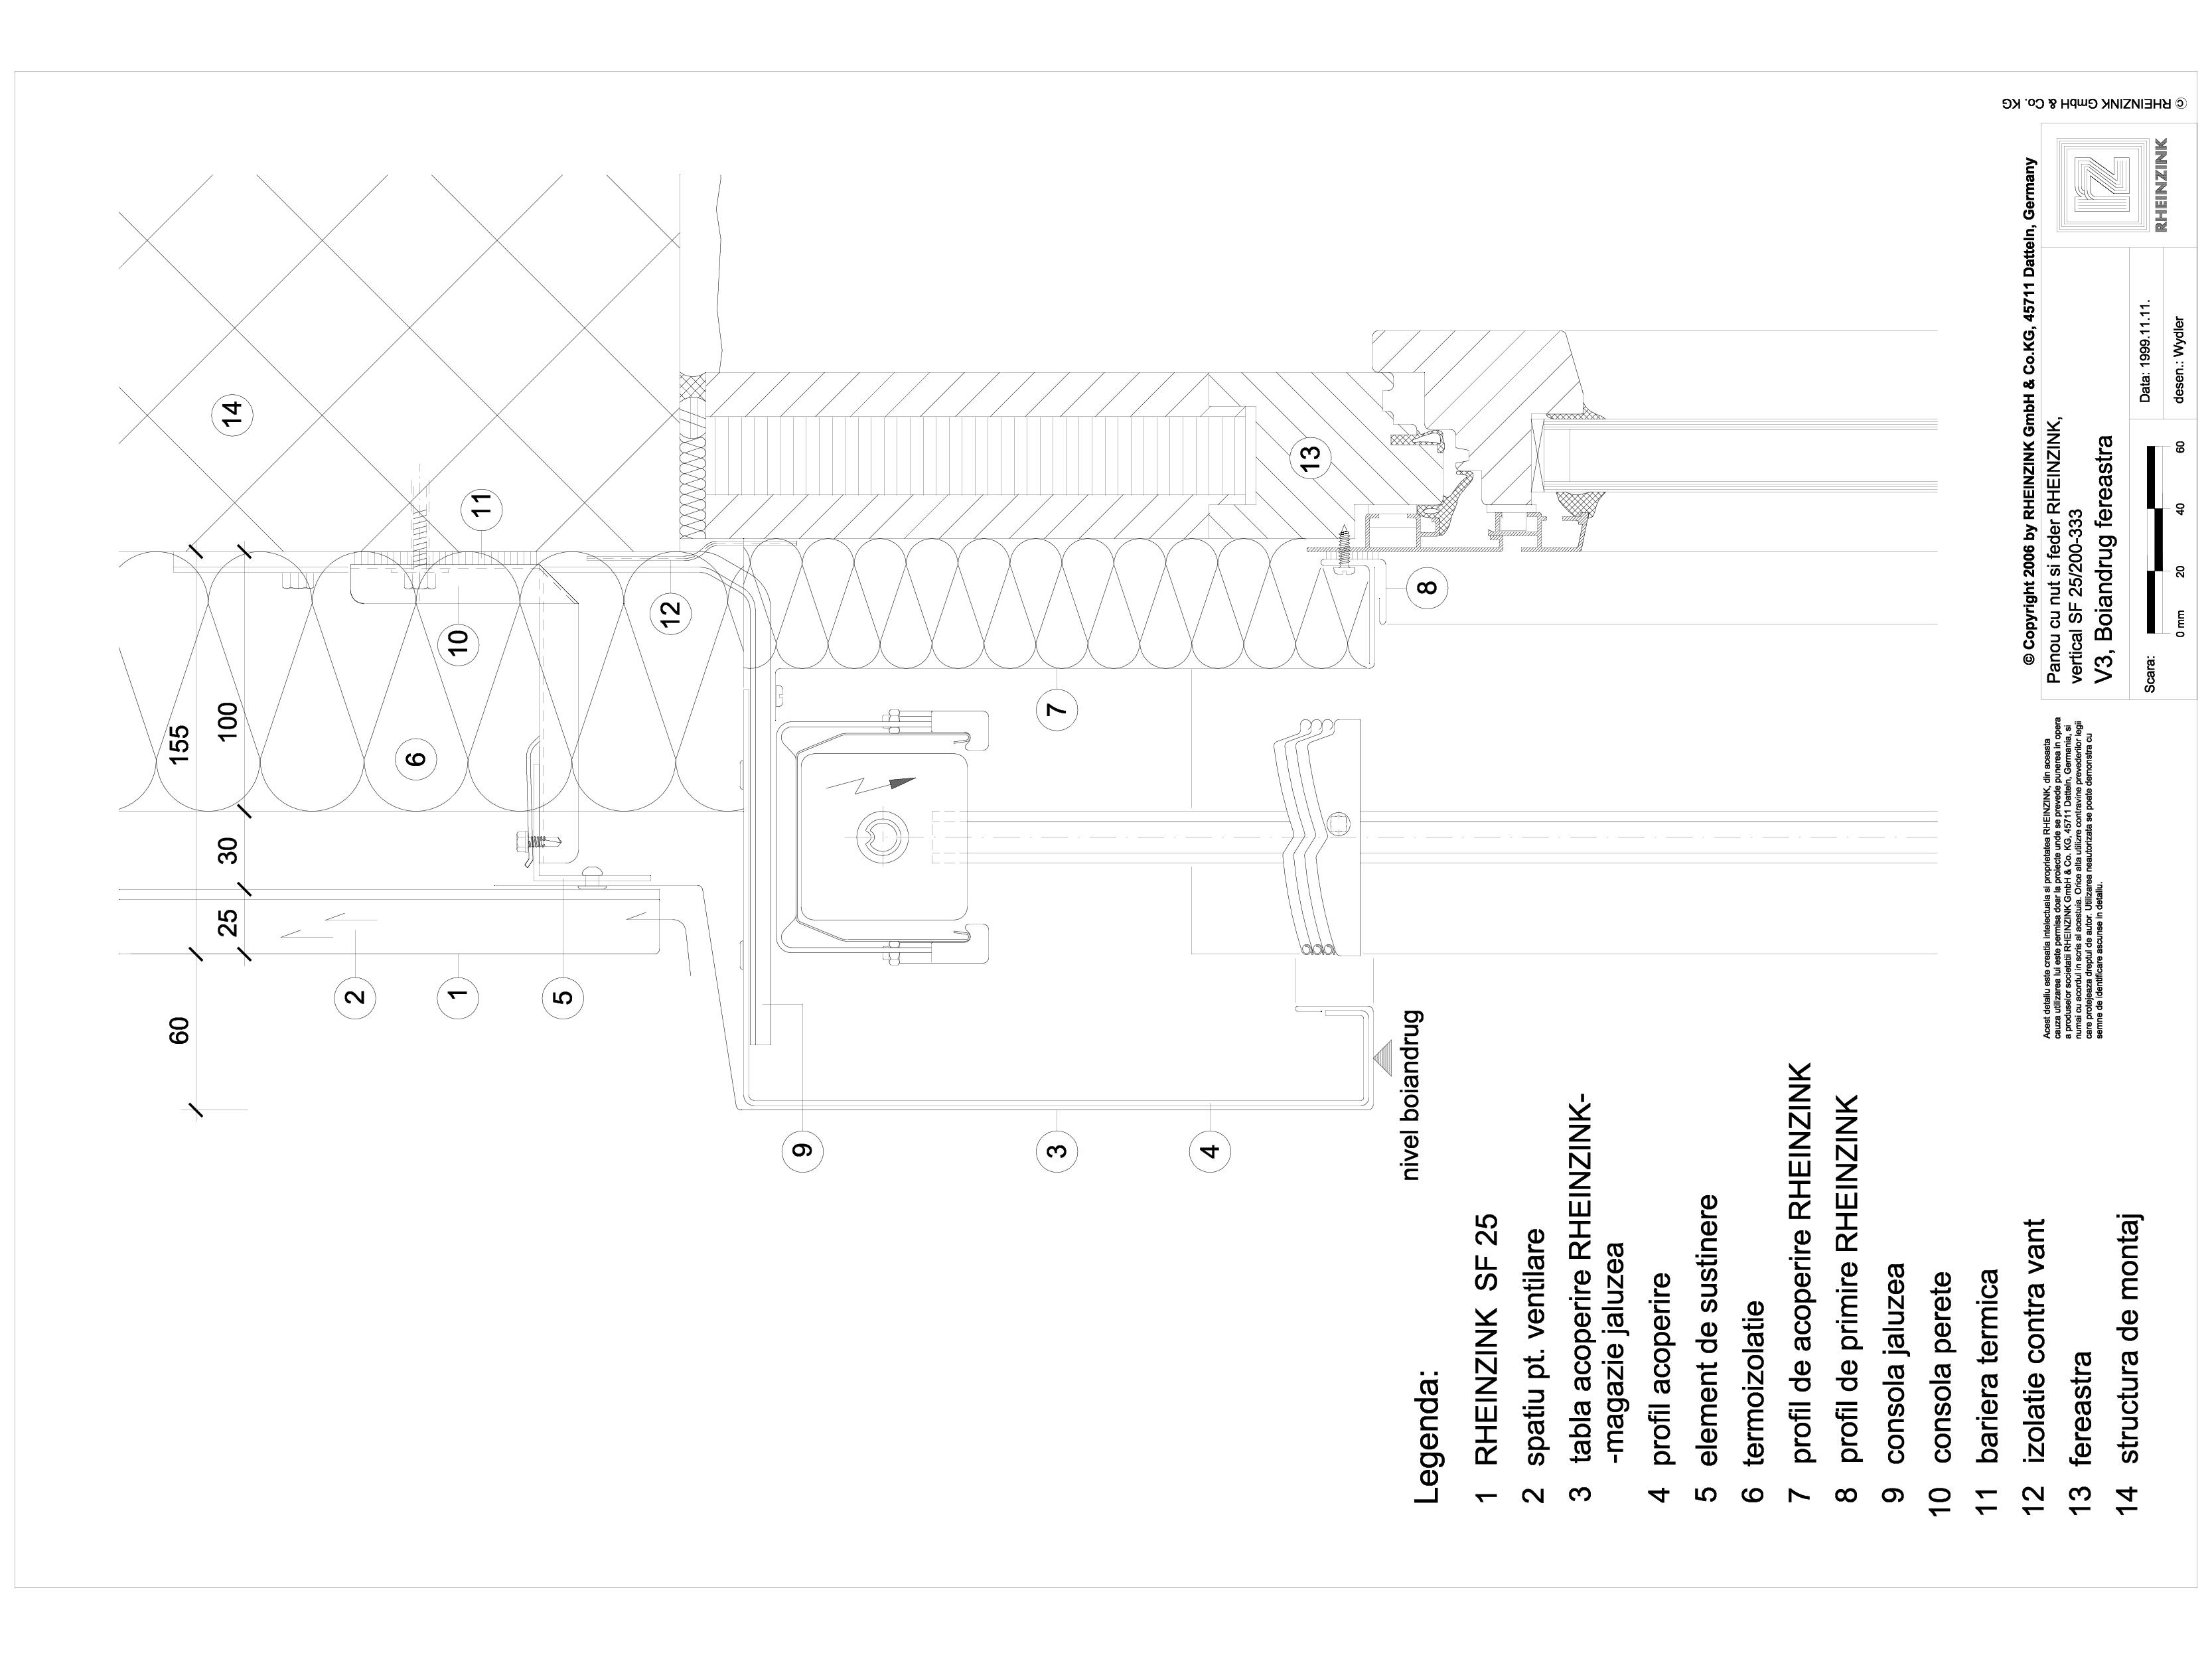 Pagina 1 - CAD-DWG Panou cu nut si feder - V3 Boiandrug fereastra cu magazia jaluzelei iesita din...